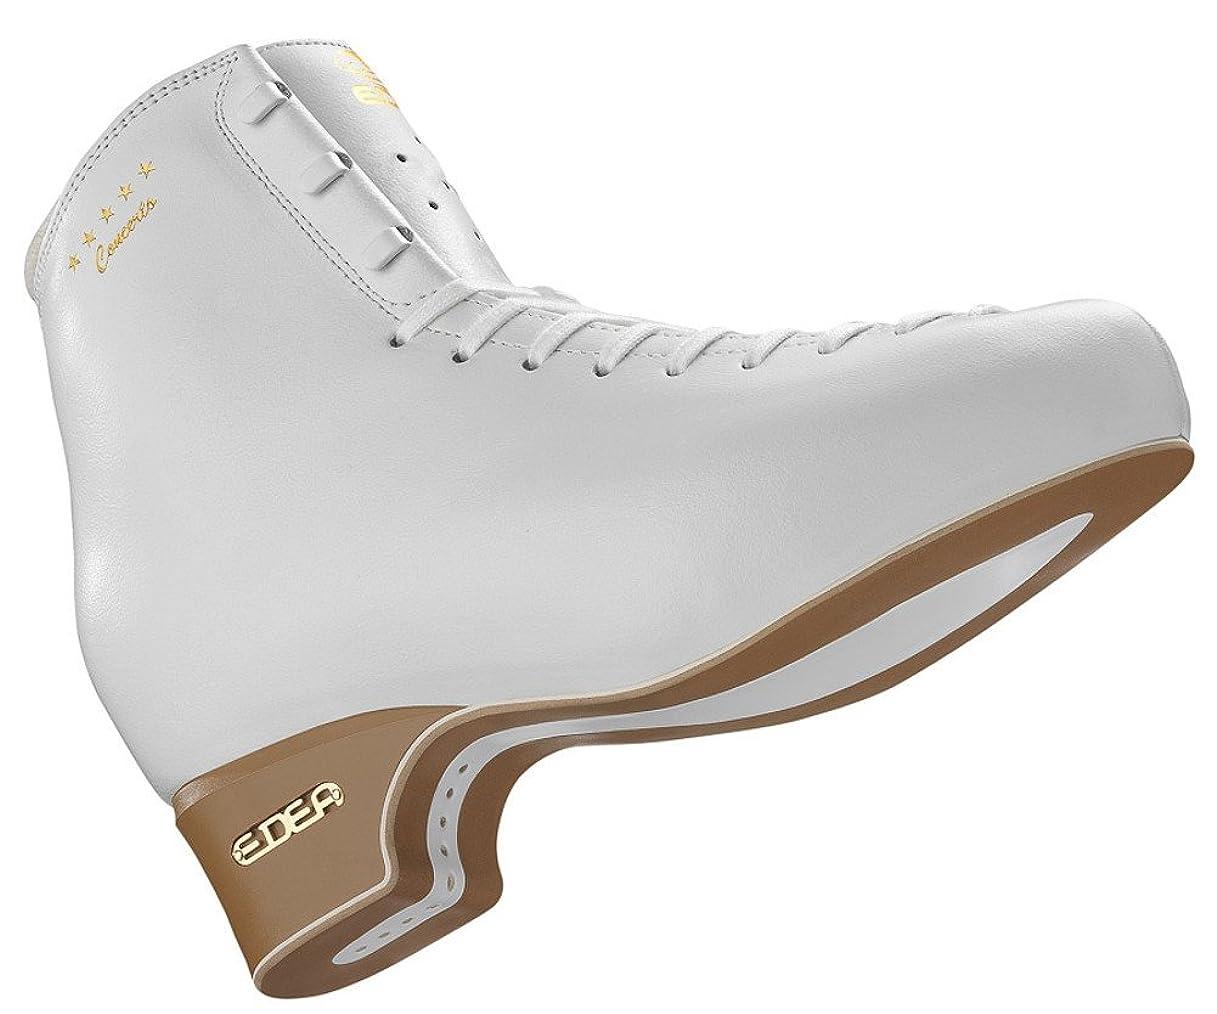 泥棒本能土器Figure skates Edea Concerto